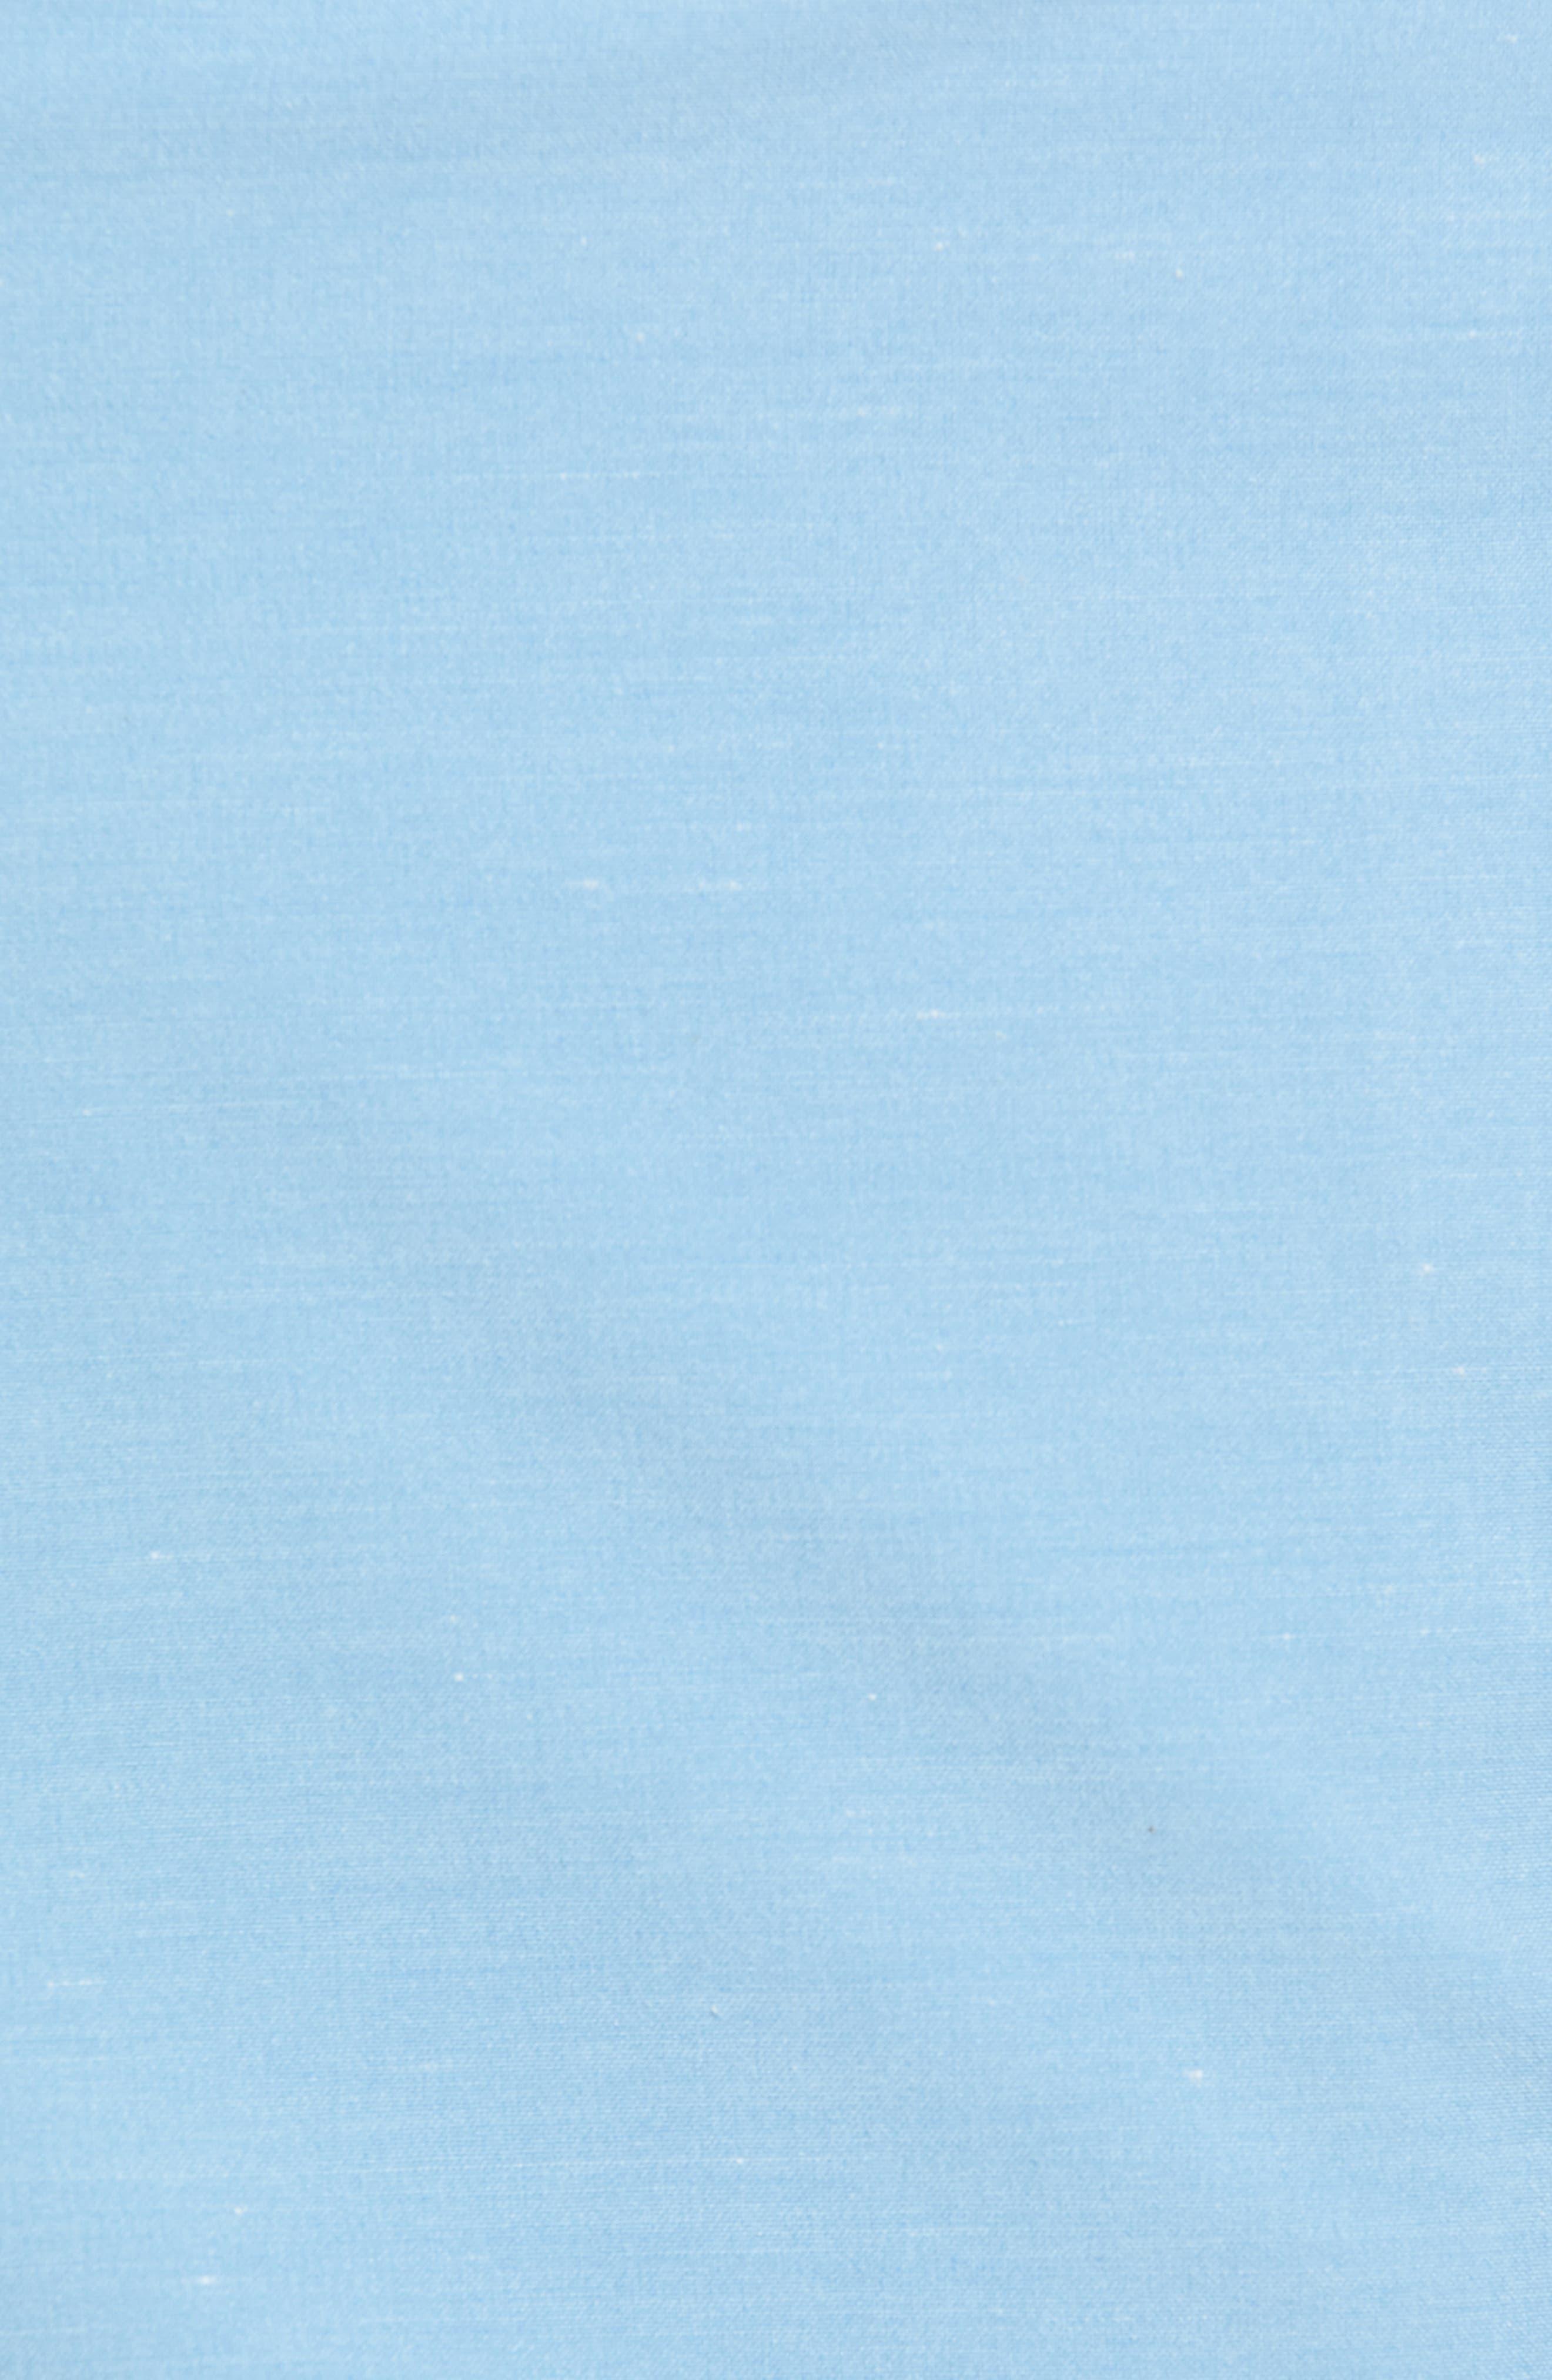 All Day Flat Front Shorts,                             Alternate thumbnail 5, color,                             COASTAL BLUE